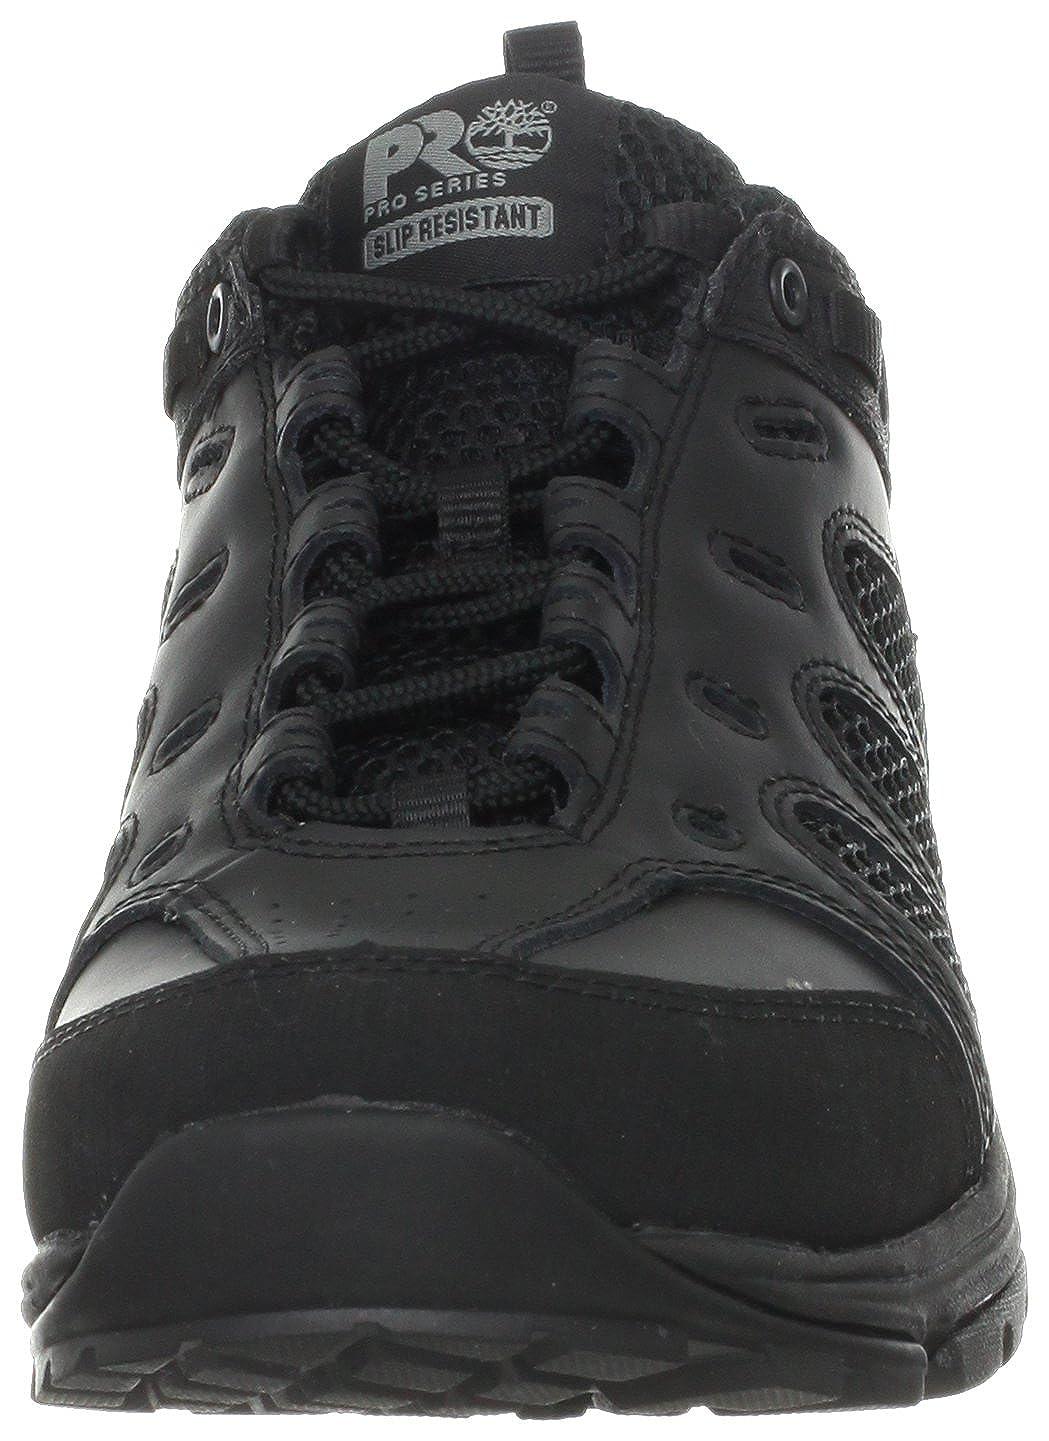 Timberland PRO Valor Men's NewMarket Pursuit Work Shoe